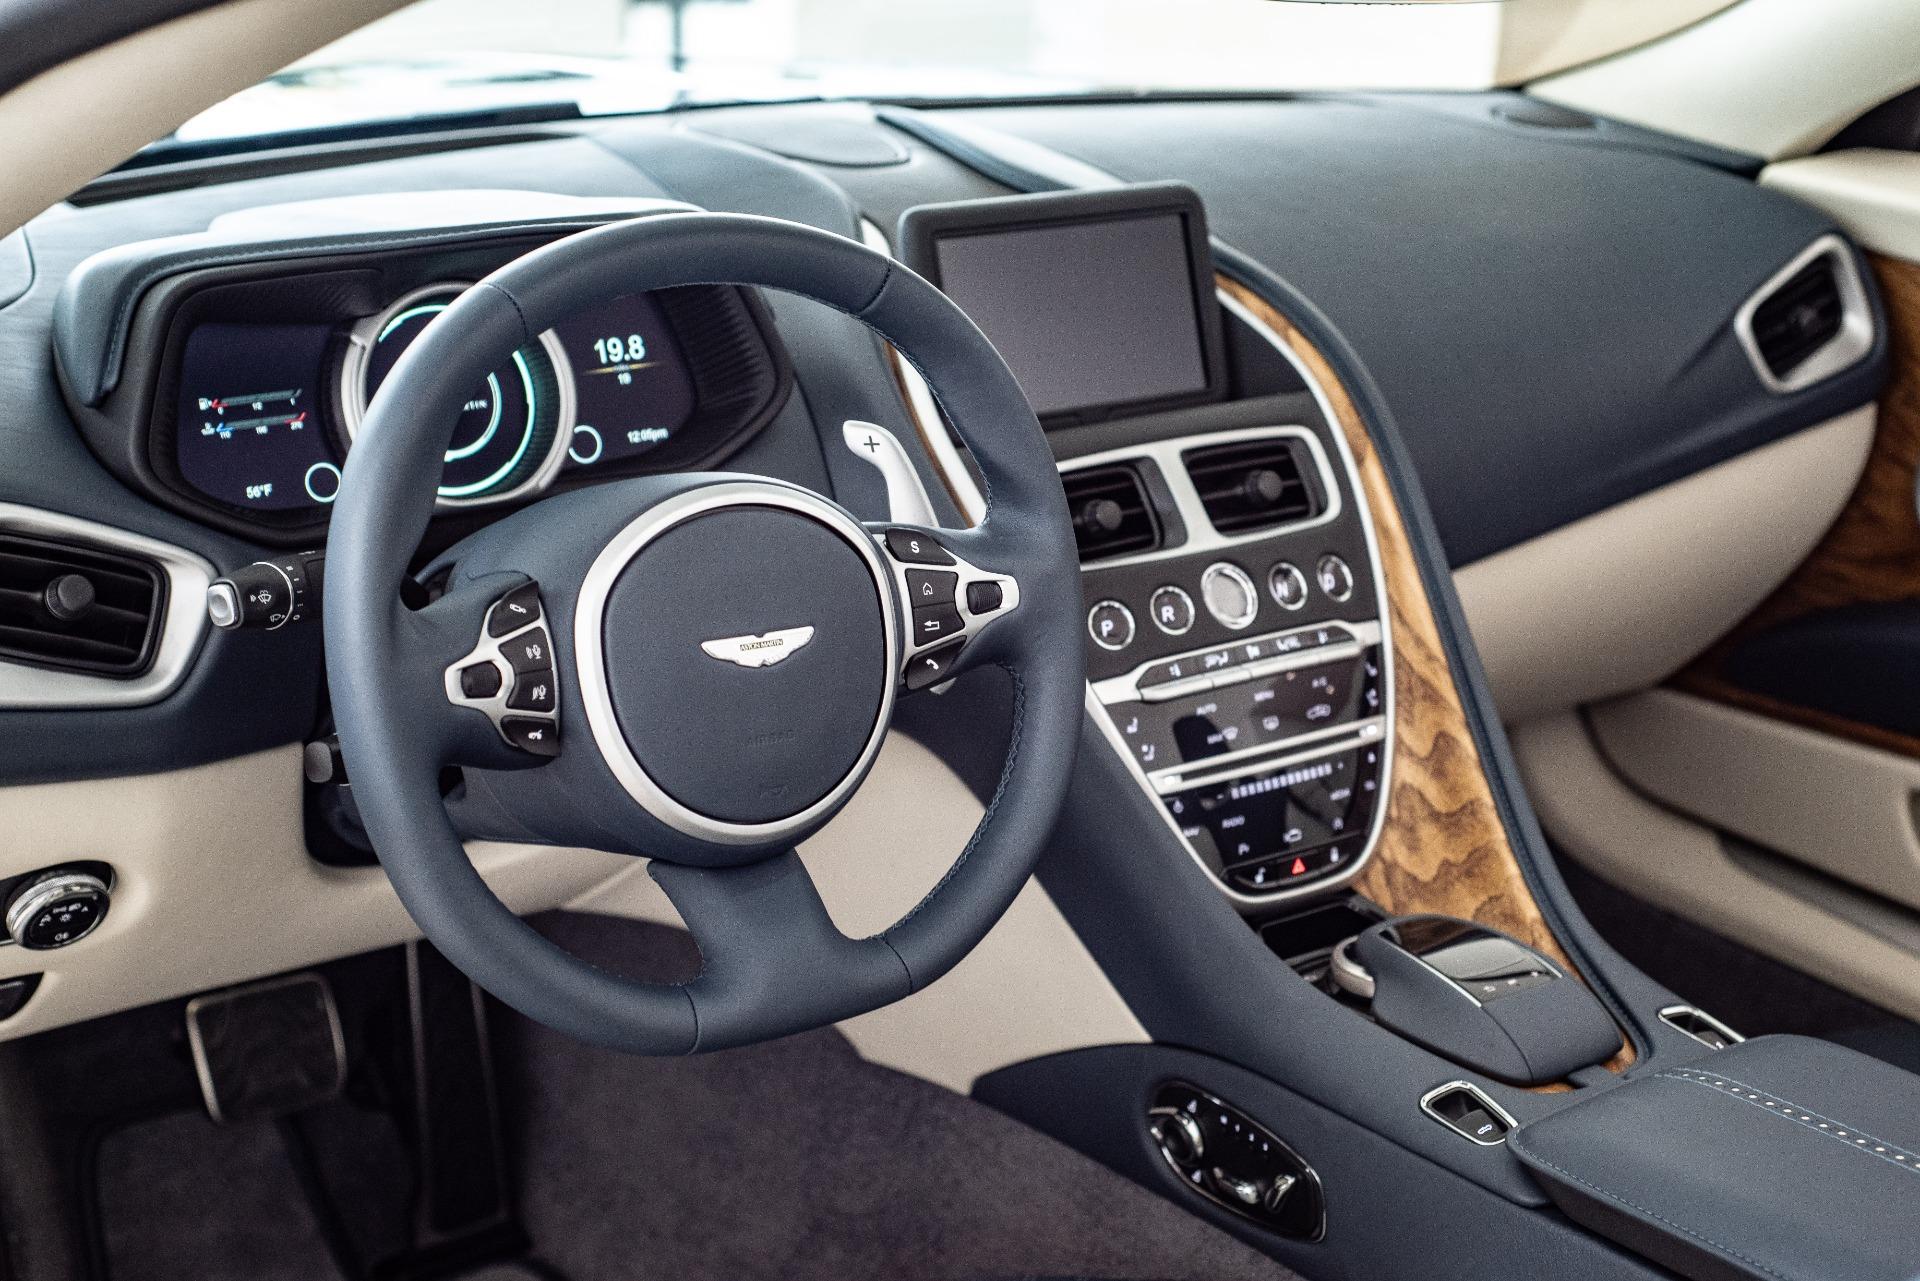 2019 Aston Martin Db11 Volante Stock 9nm06940 For Sale Near Vienna